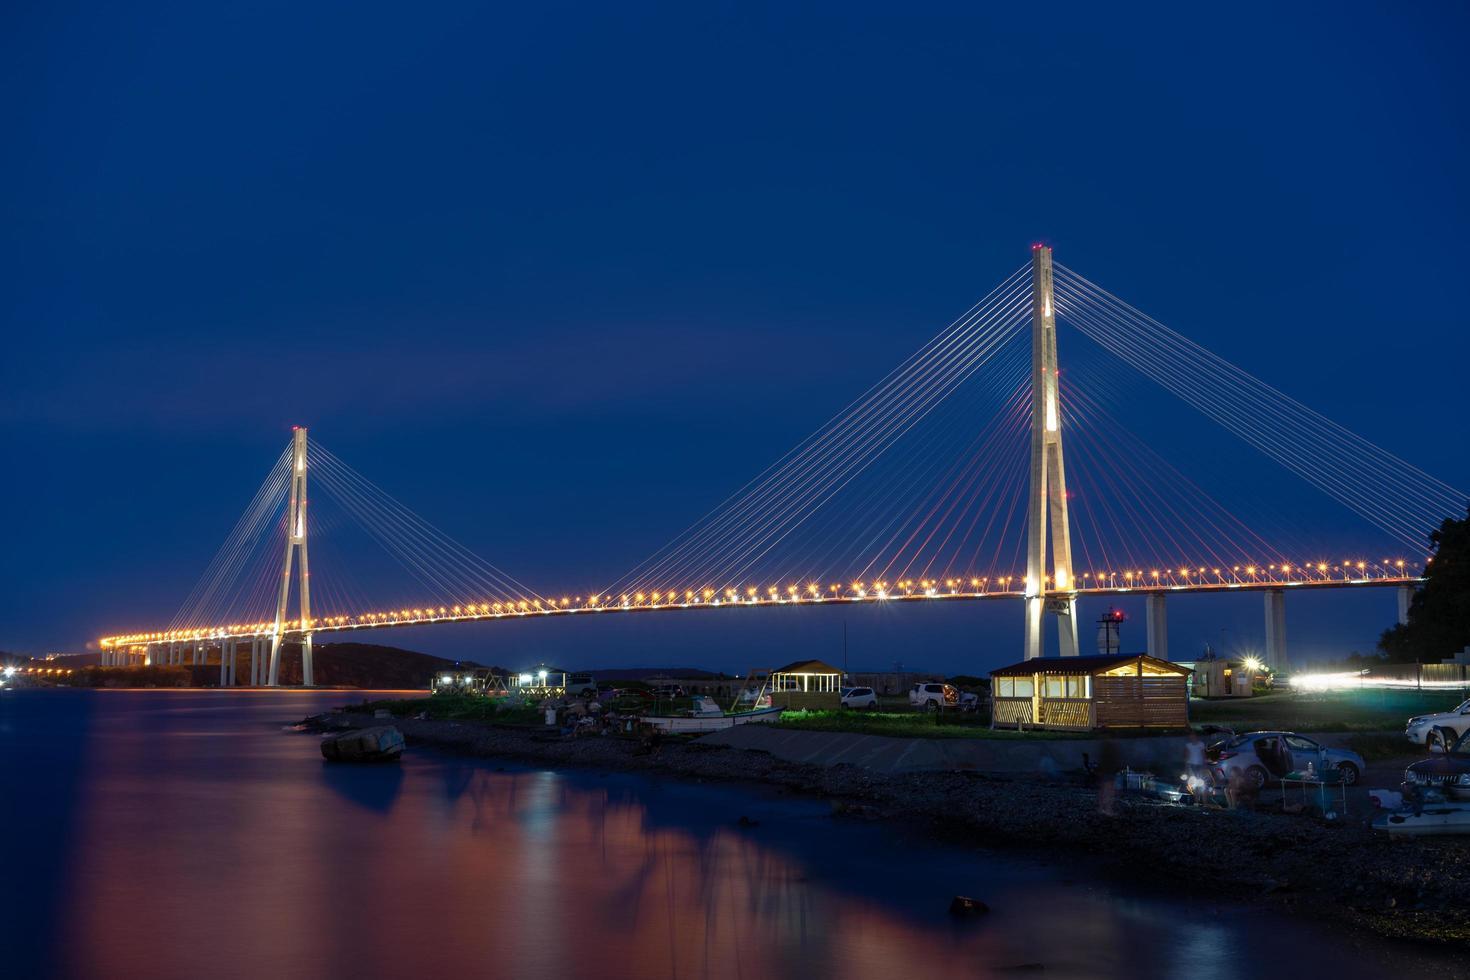 vladivostok, rússia. paisagem noturna com vista para a ponte russa. foto